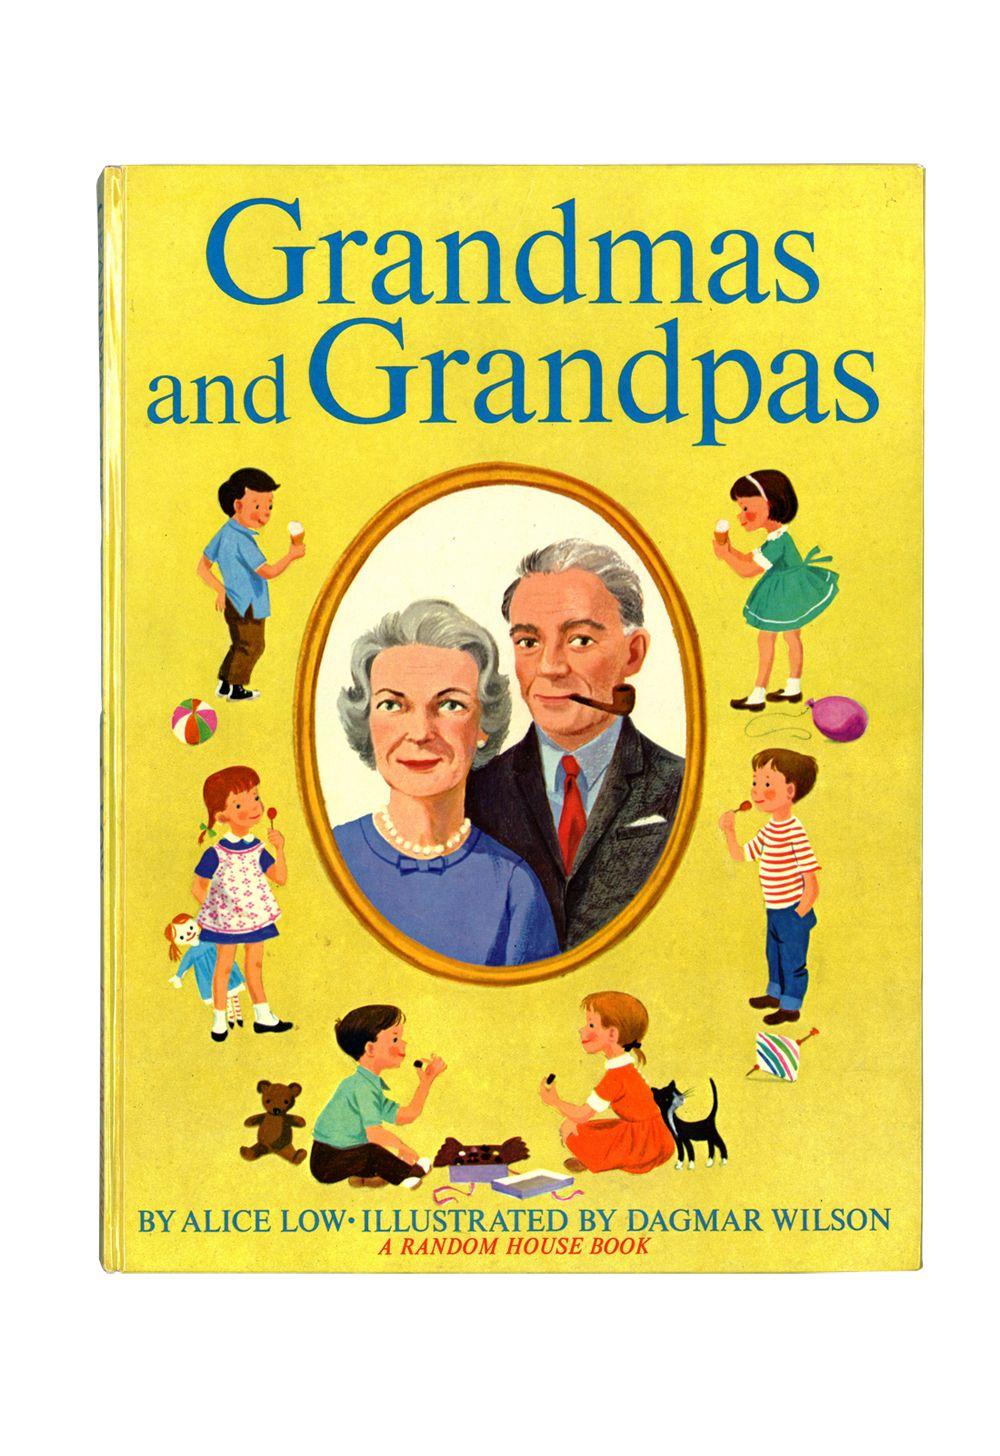 Grandmas and grandpas vintage childrens book 1962